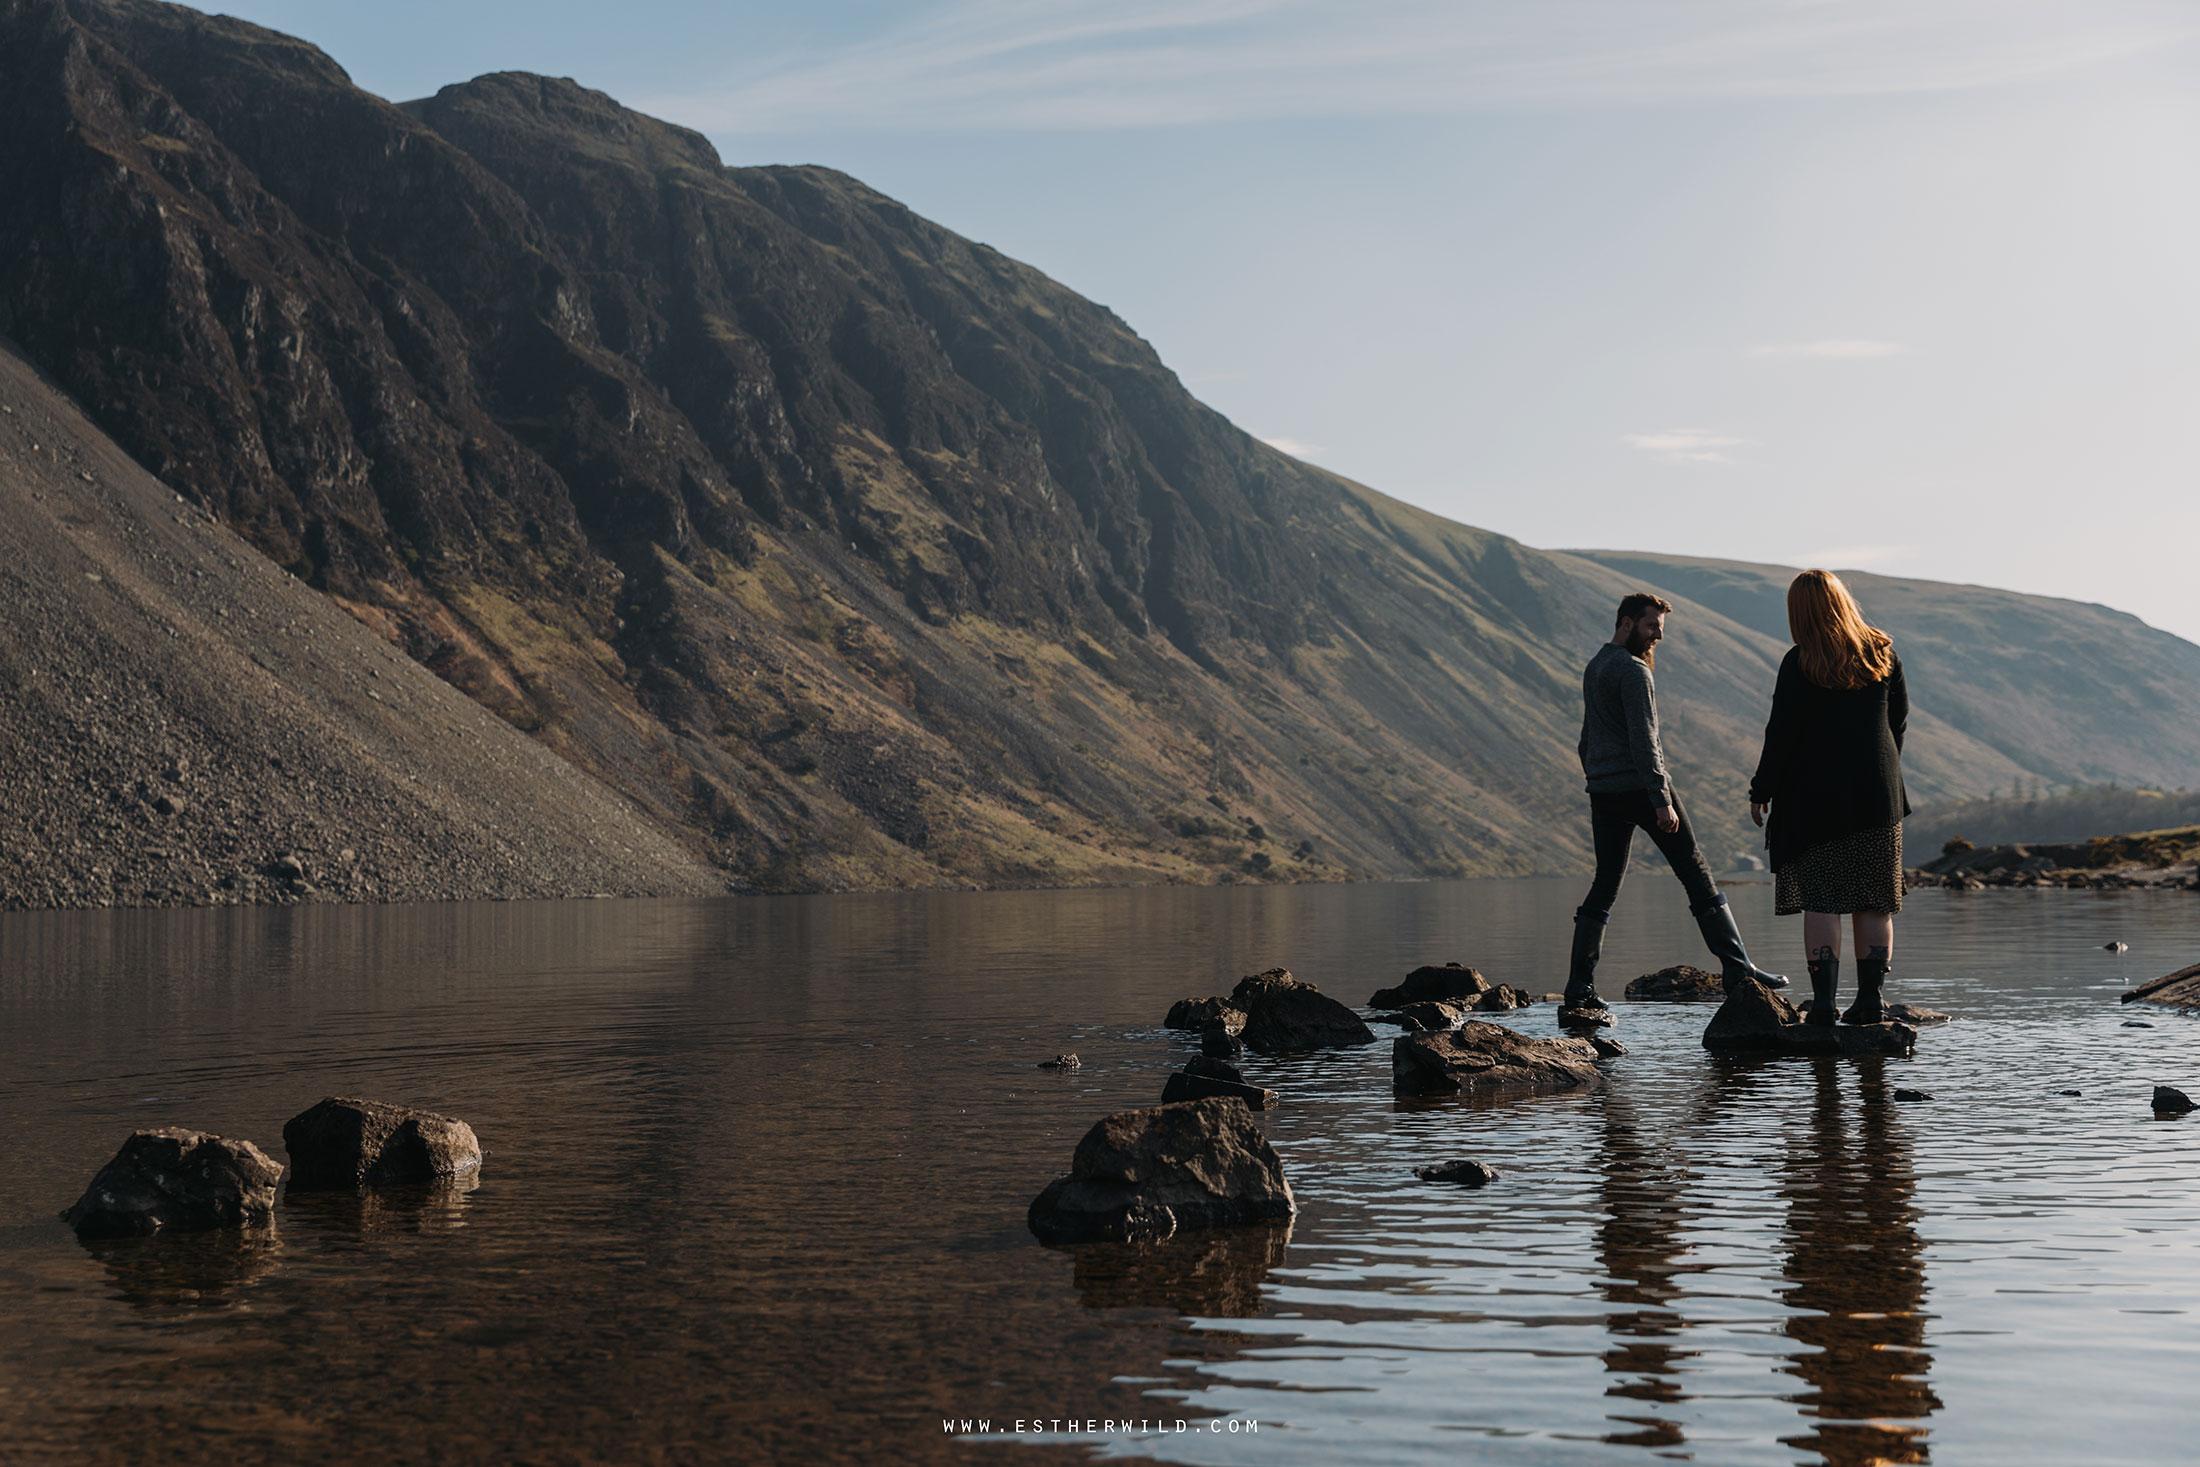 Cumbria_Lake_District_Wasdale_Wedding_Photographer_Destination_Engagement_Anniversary_Esther_Wild_IMG_3513.jpg